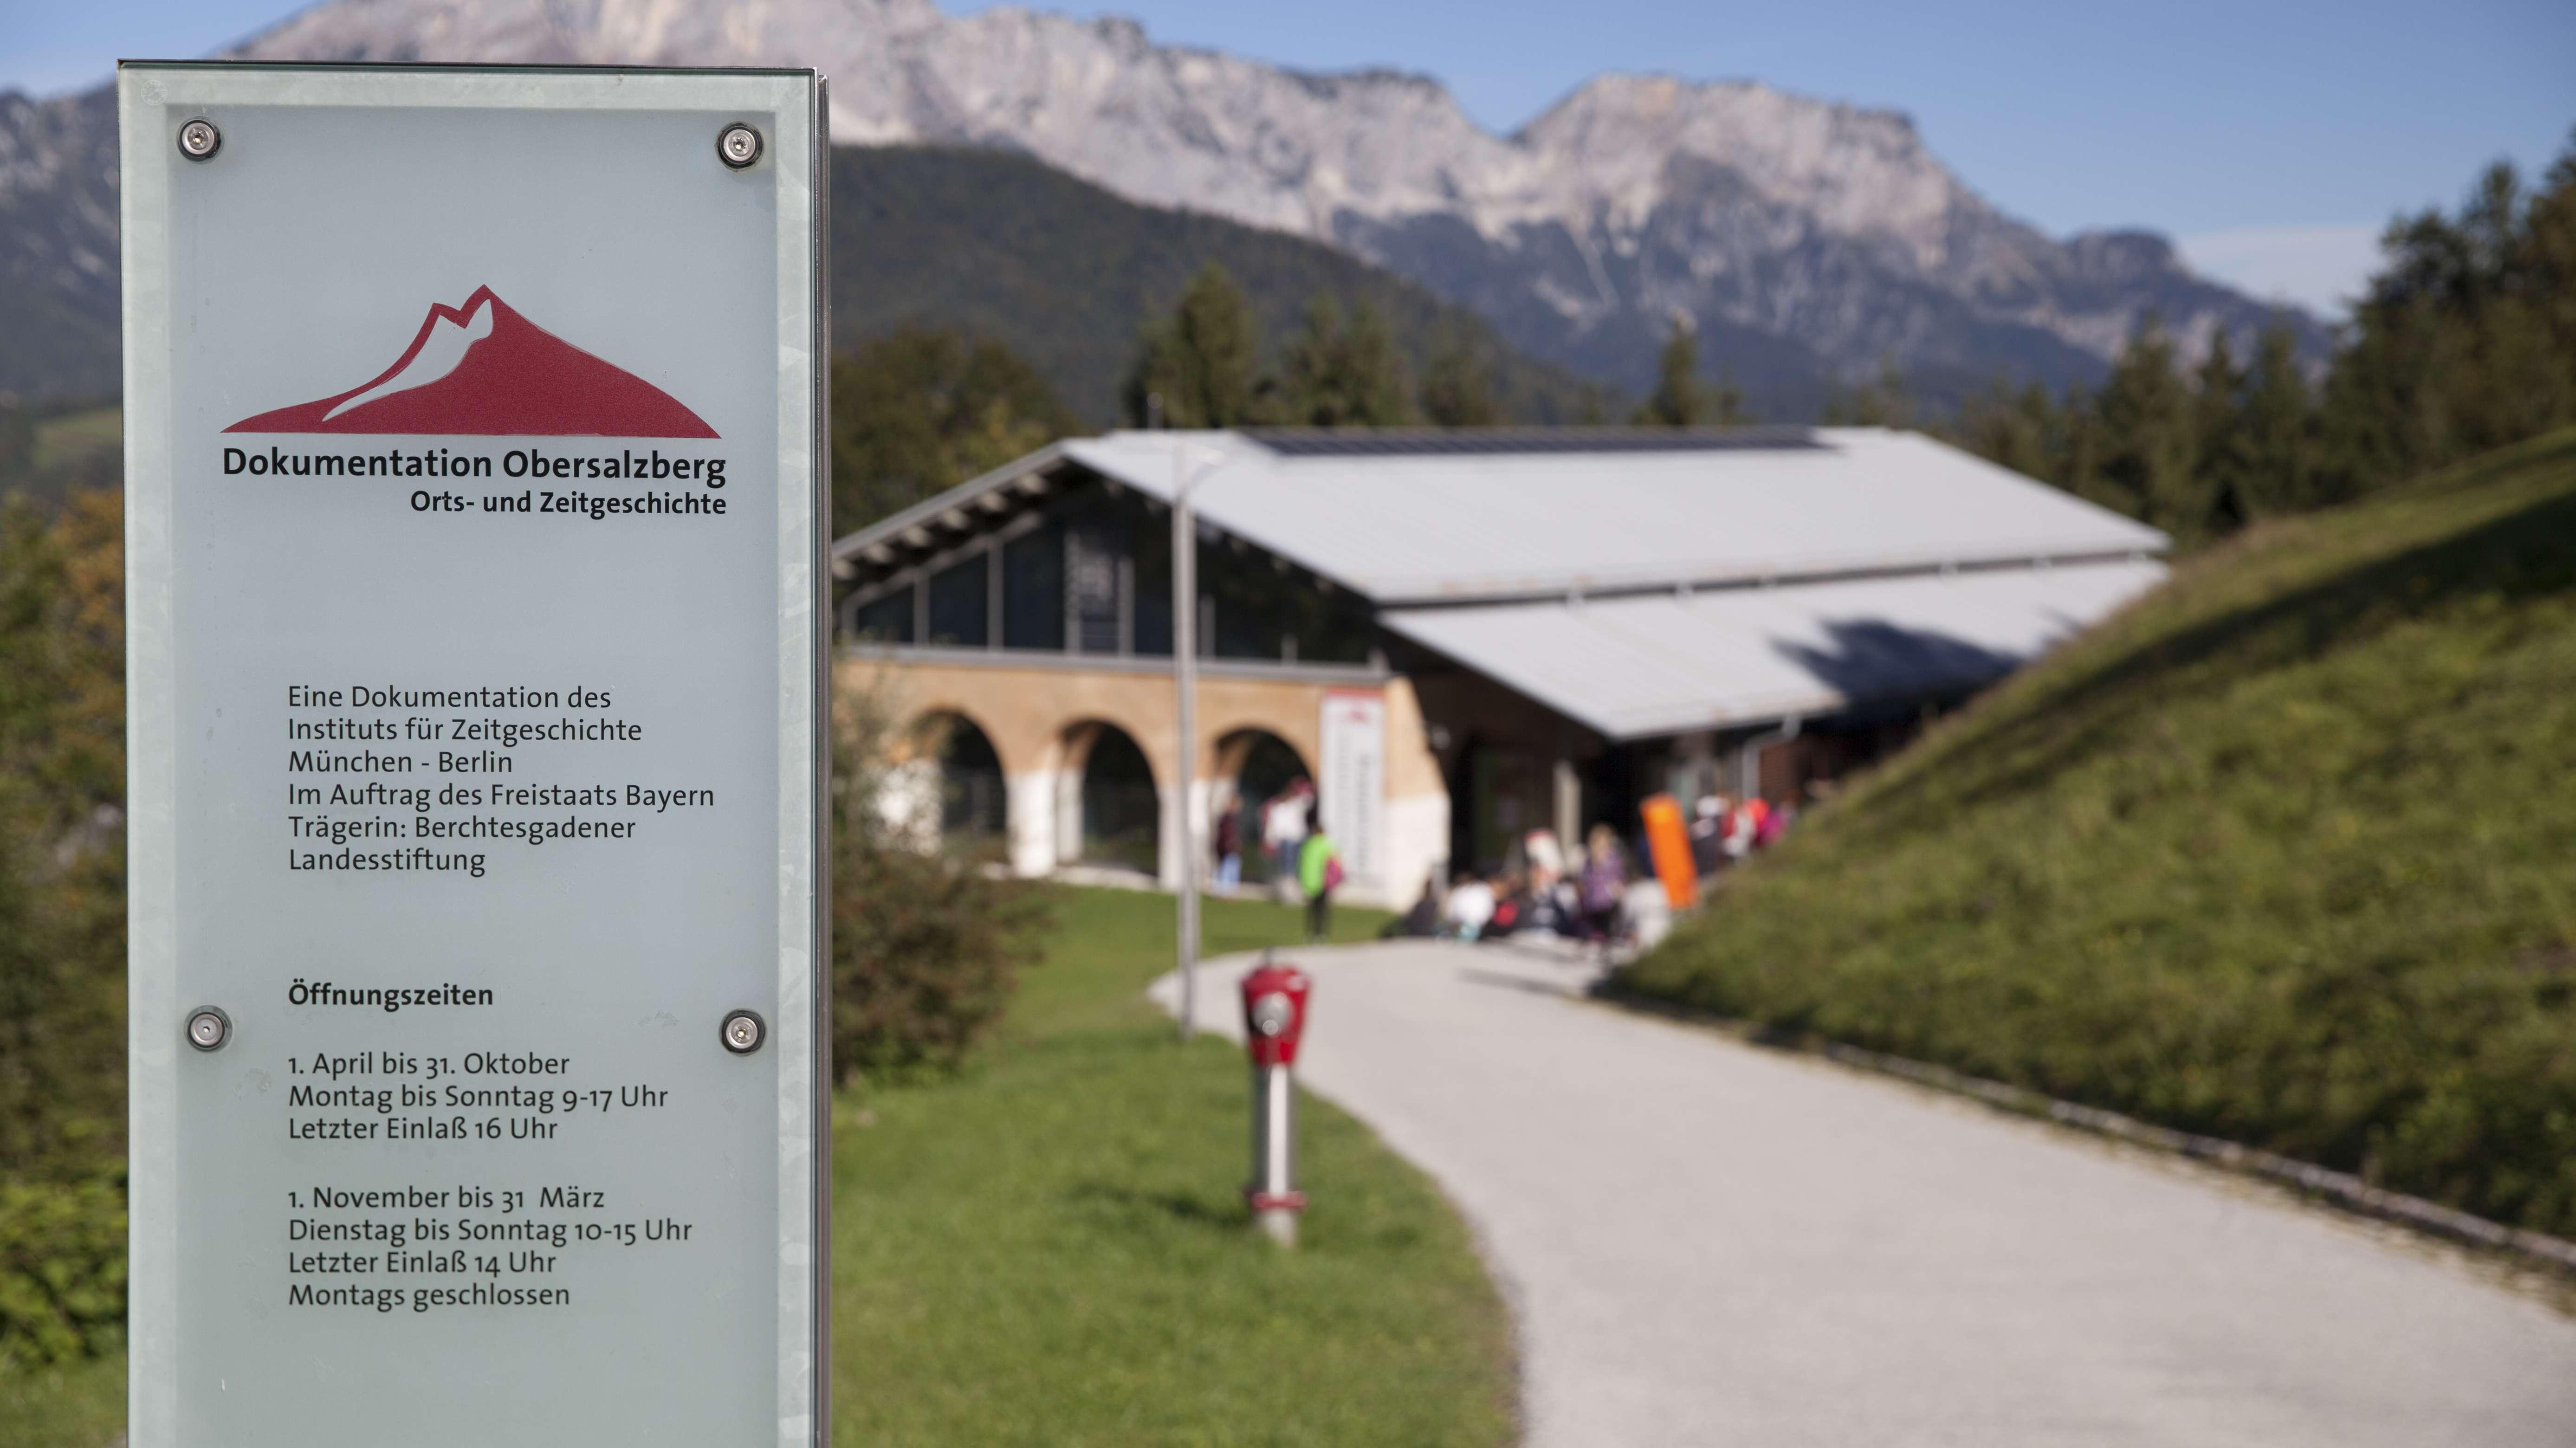 Das Dokumentationszentrum Obersalzberg in Berchtesgaden